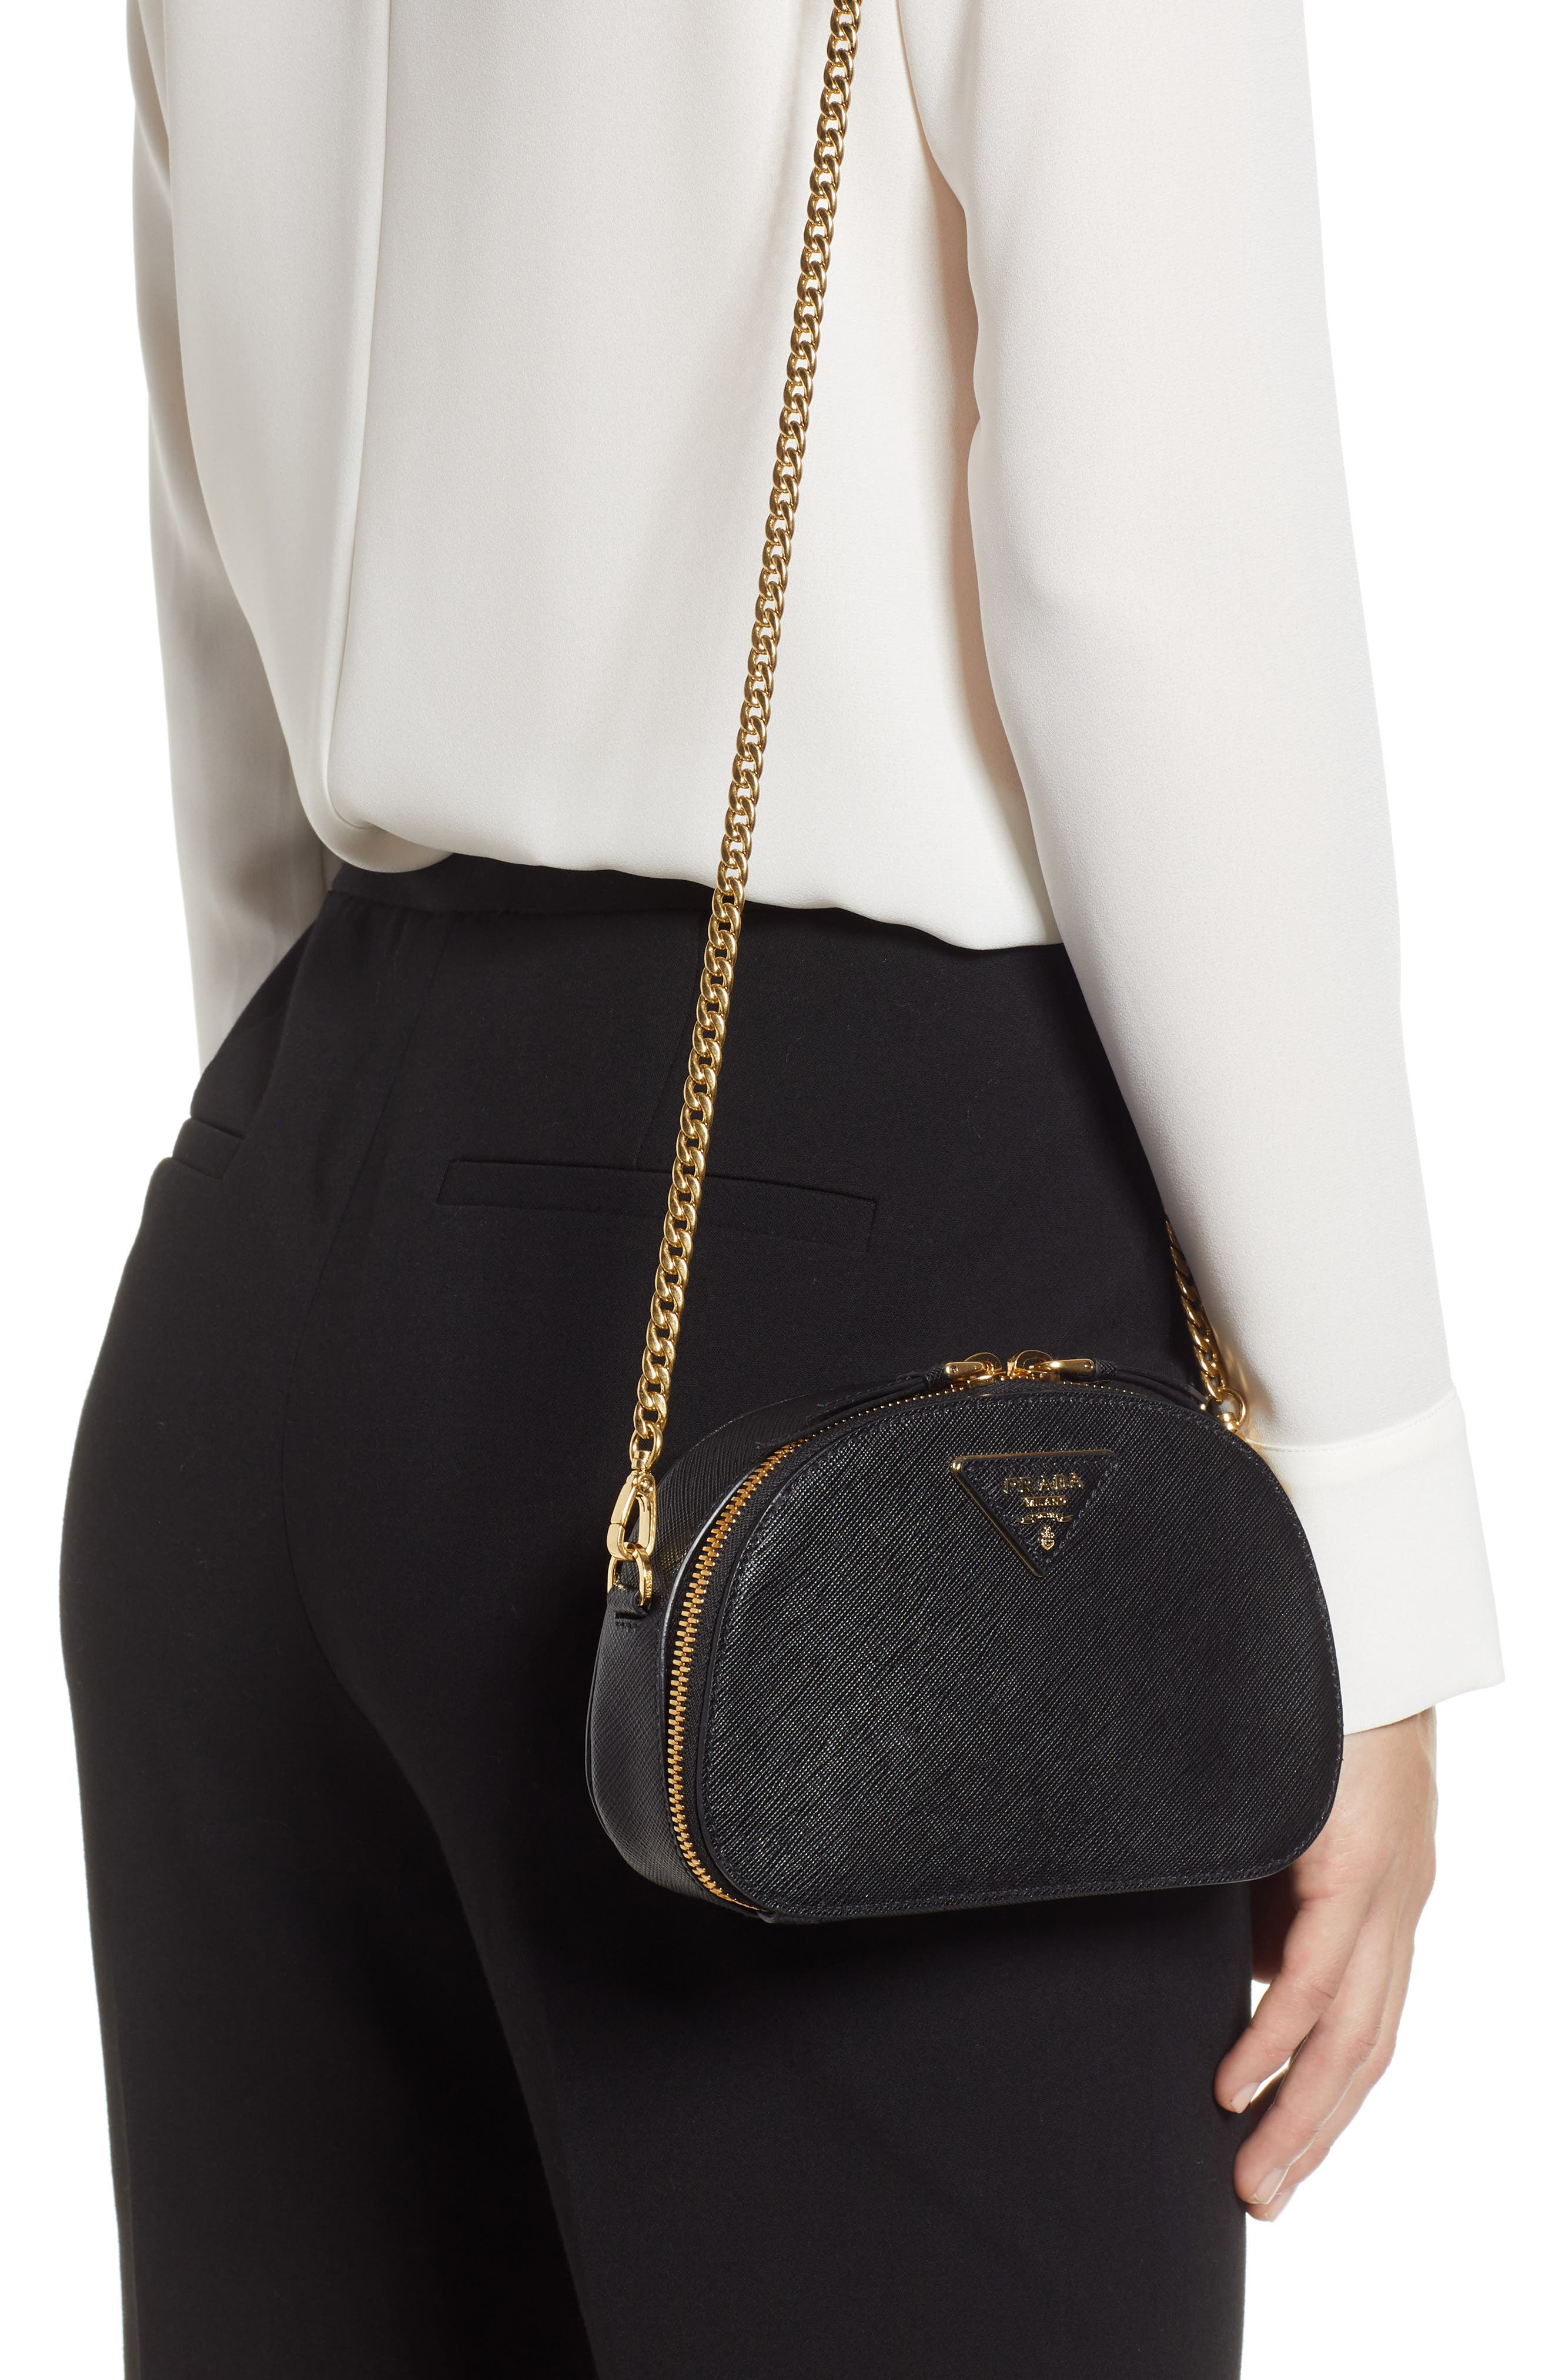 PRADA, Saffiano Leather Belt Bag, Alternate thumbnail 3, color, 001